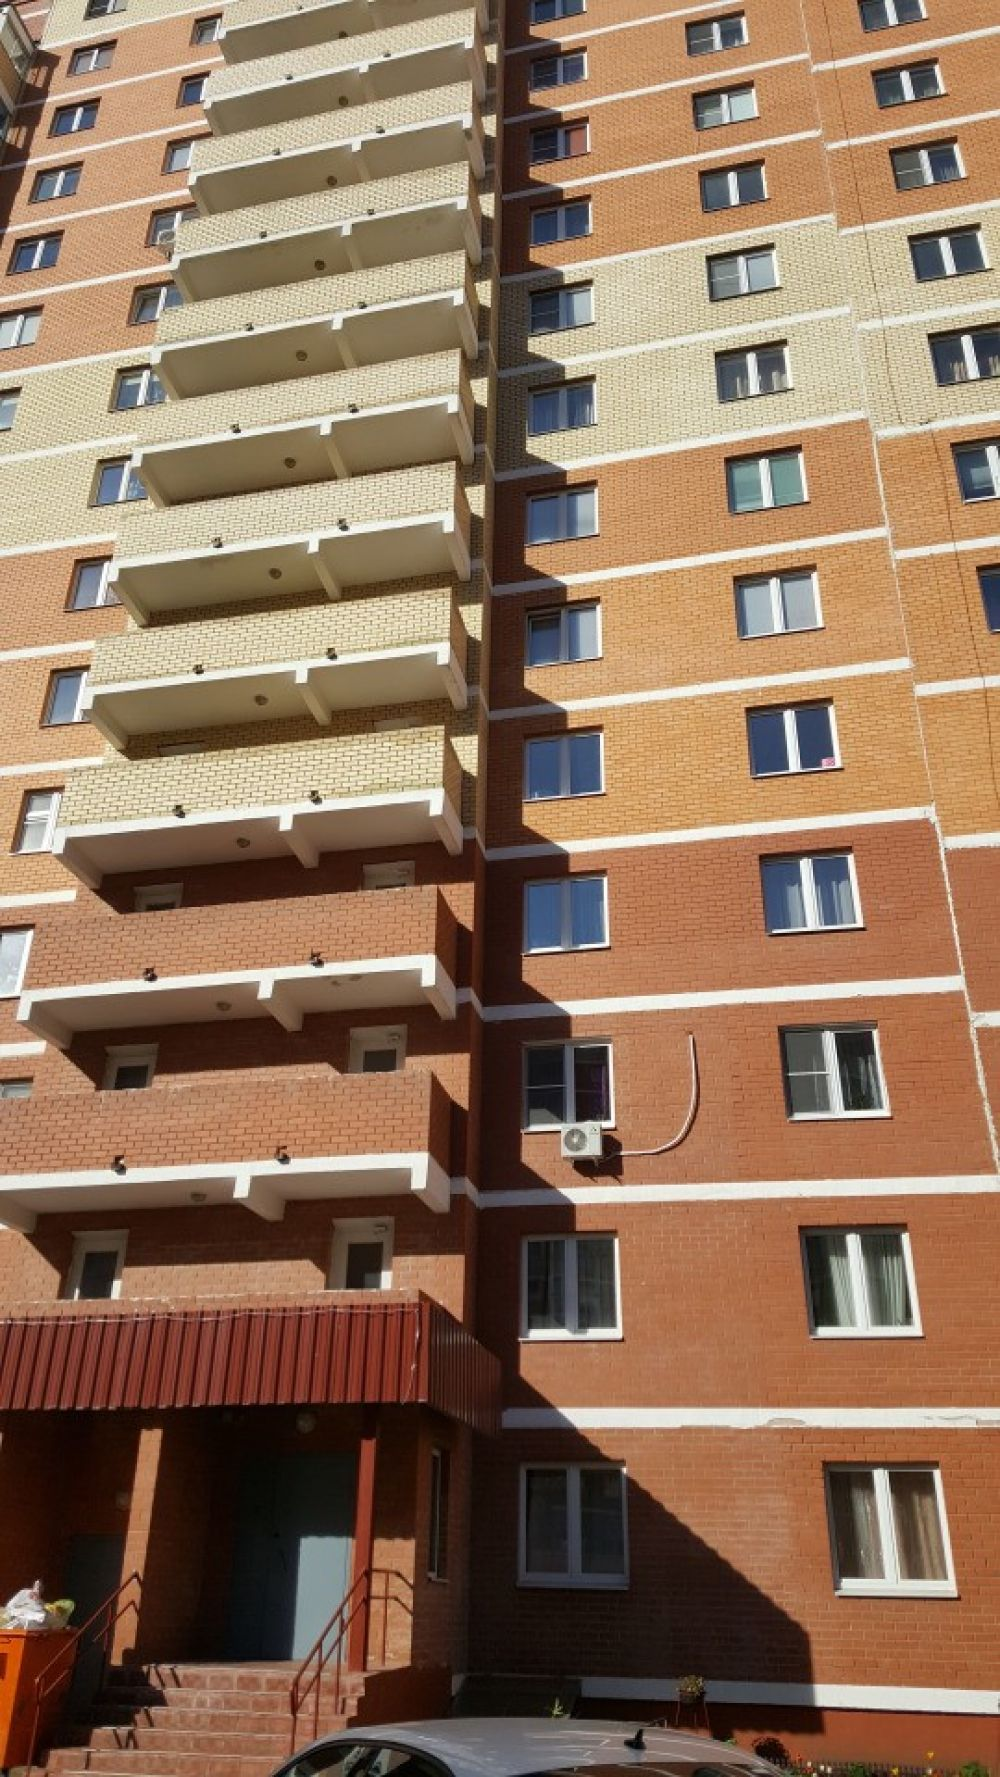 1-к квартира 30 м2, Щёлково, микрорайон Богородский, 16, фото 14